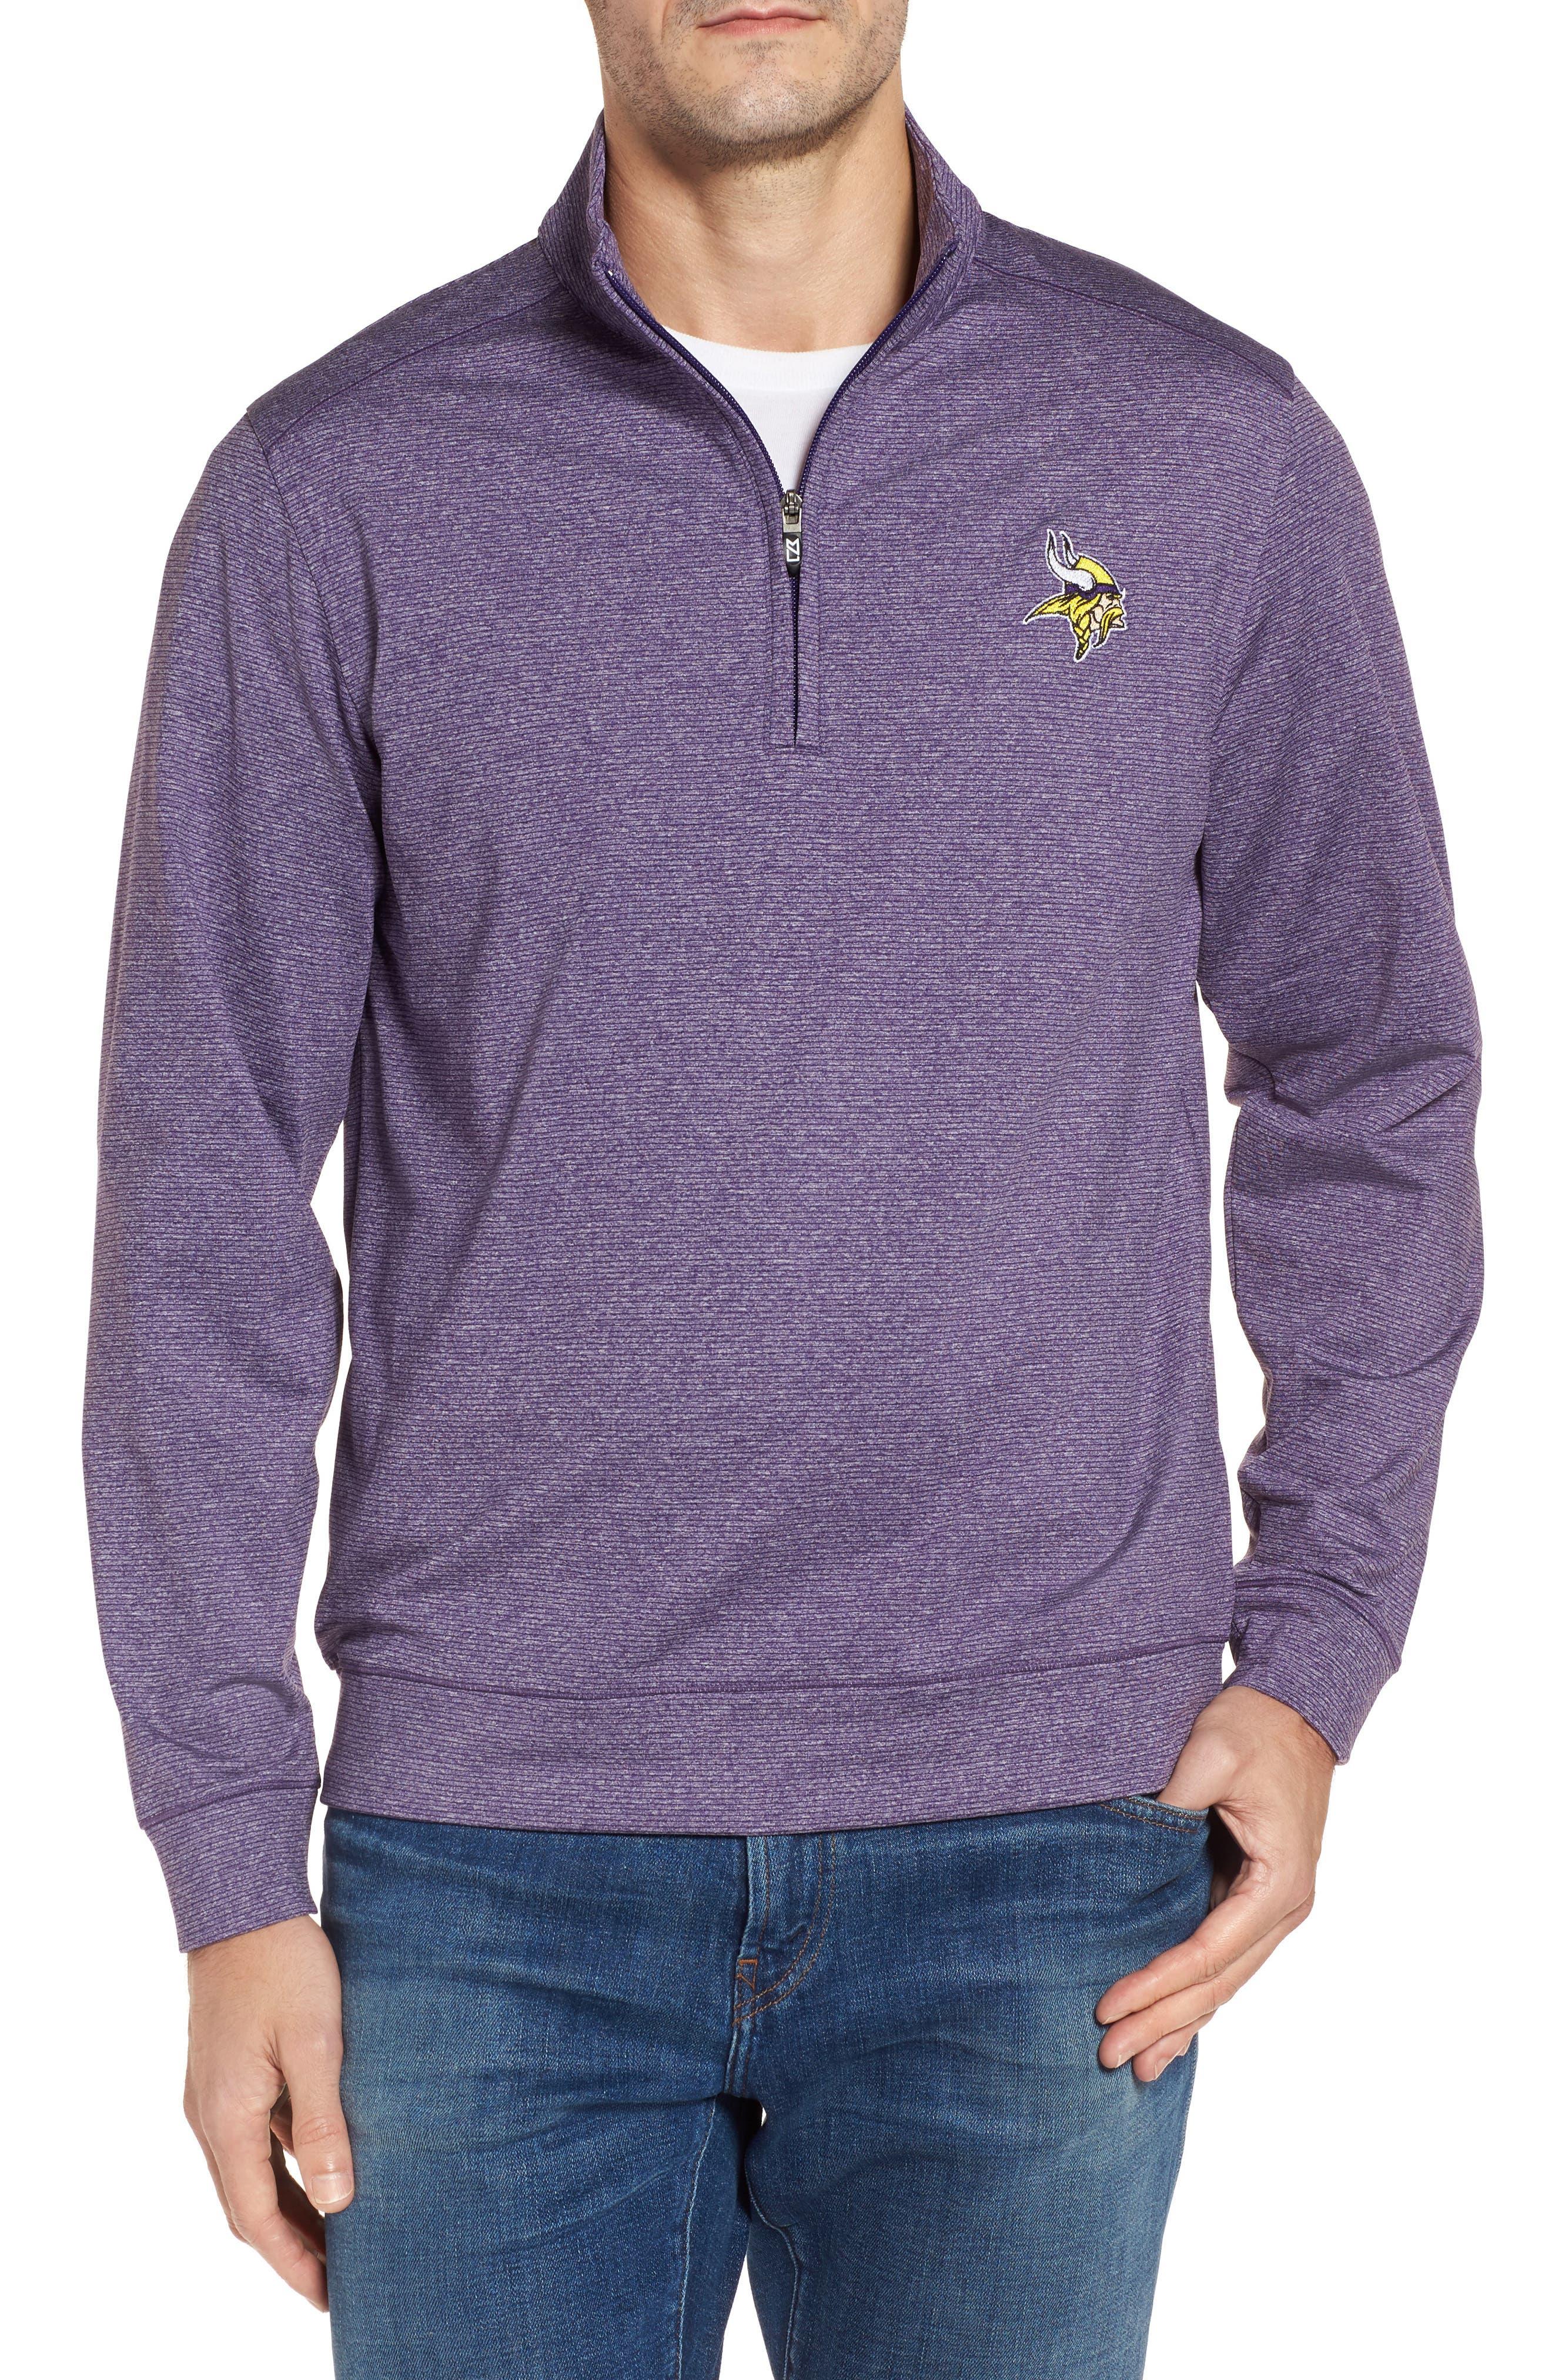 Cutter & Buck Shoreline - Minnesota Vikings Half Zip Pullover